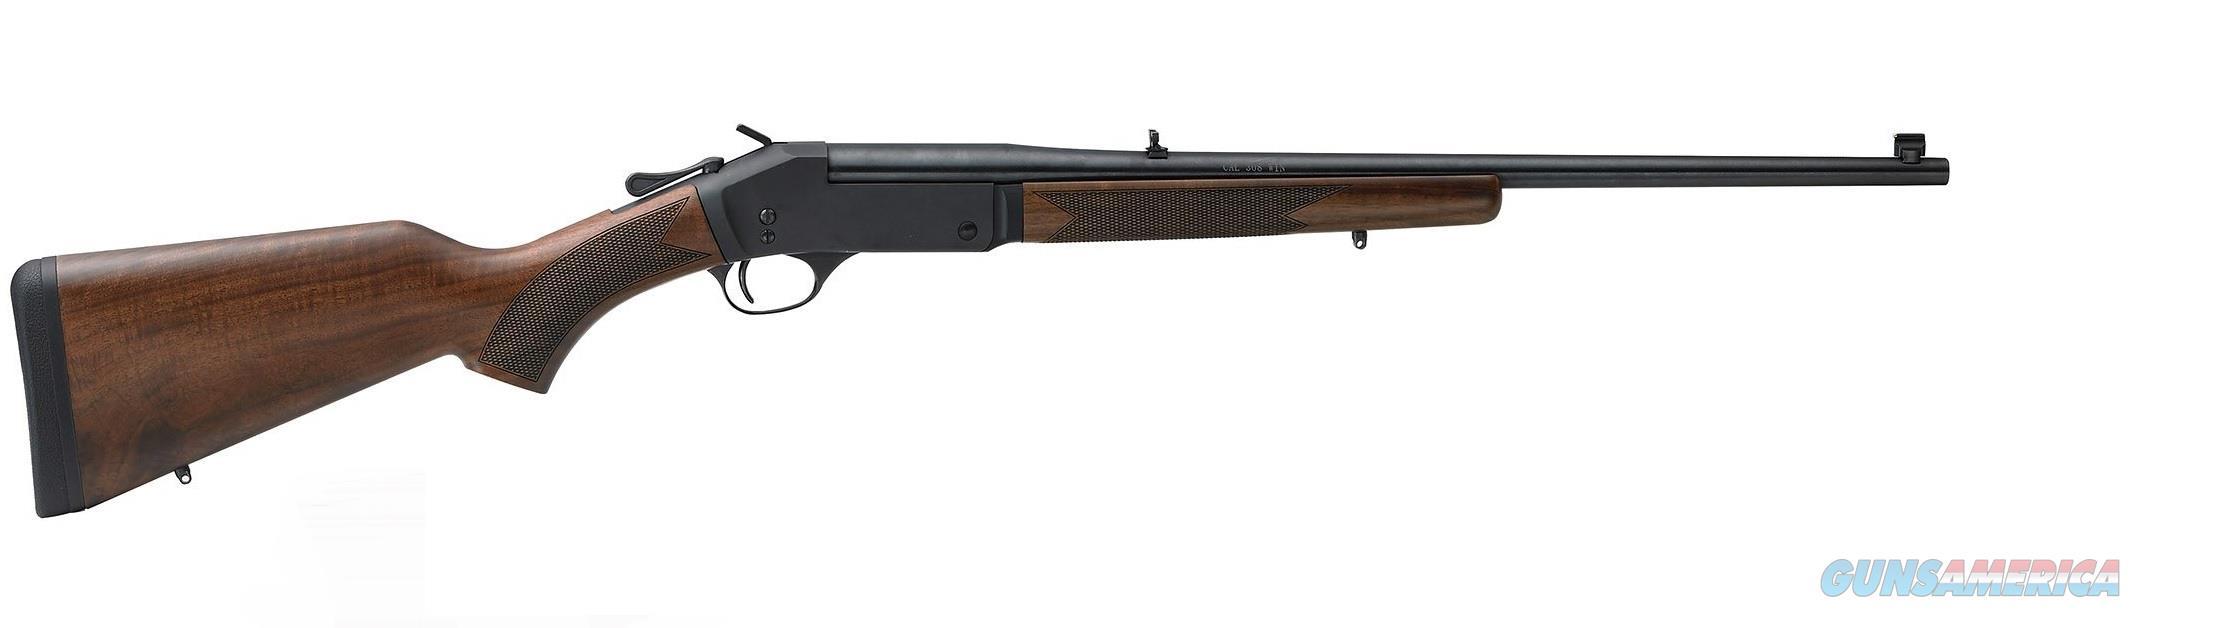 "Henry Single Shot Rifle .243 Winchester 22"" Blued H015-243   Guns > Rifles > Henry Rifle Company"